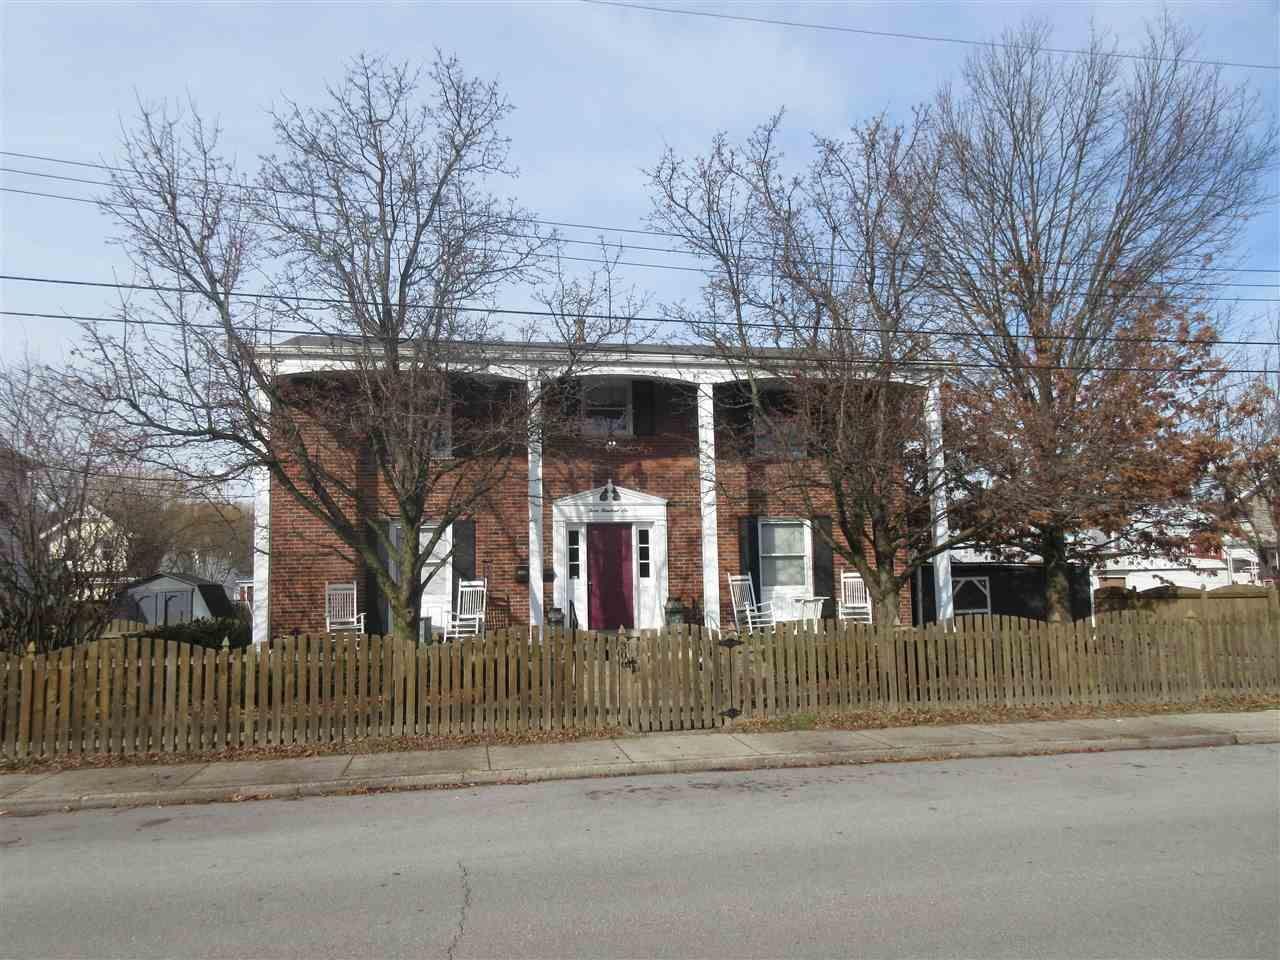 306 W 35th, Covington, Kentucky